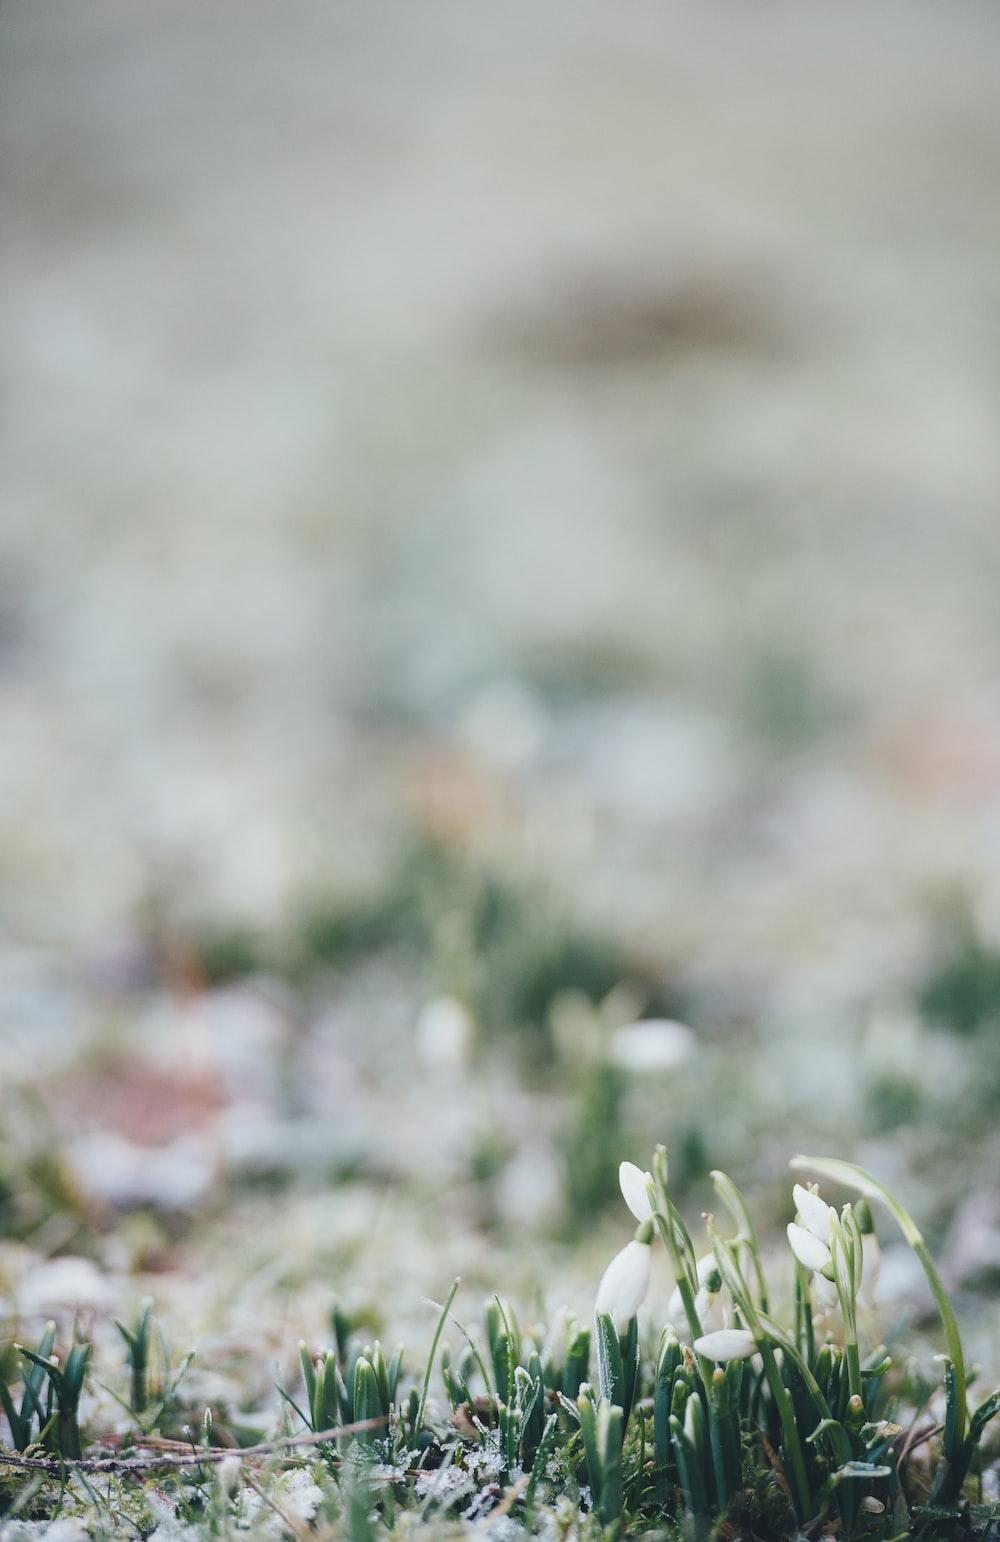 selective focus photo of white flowerbud